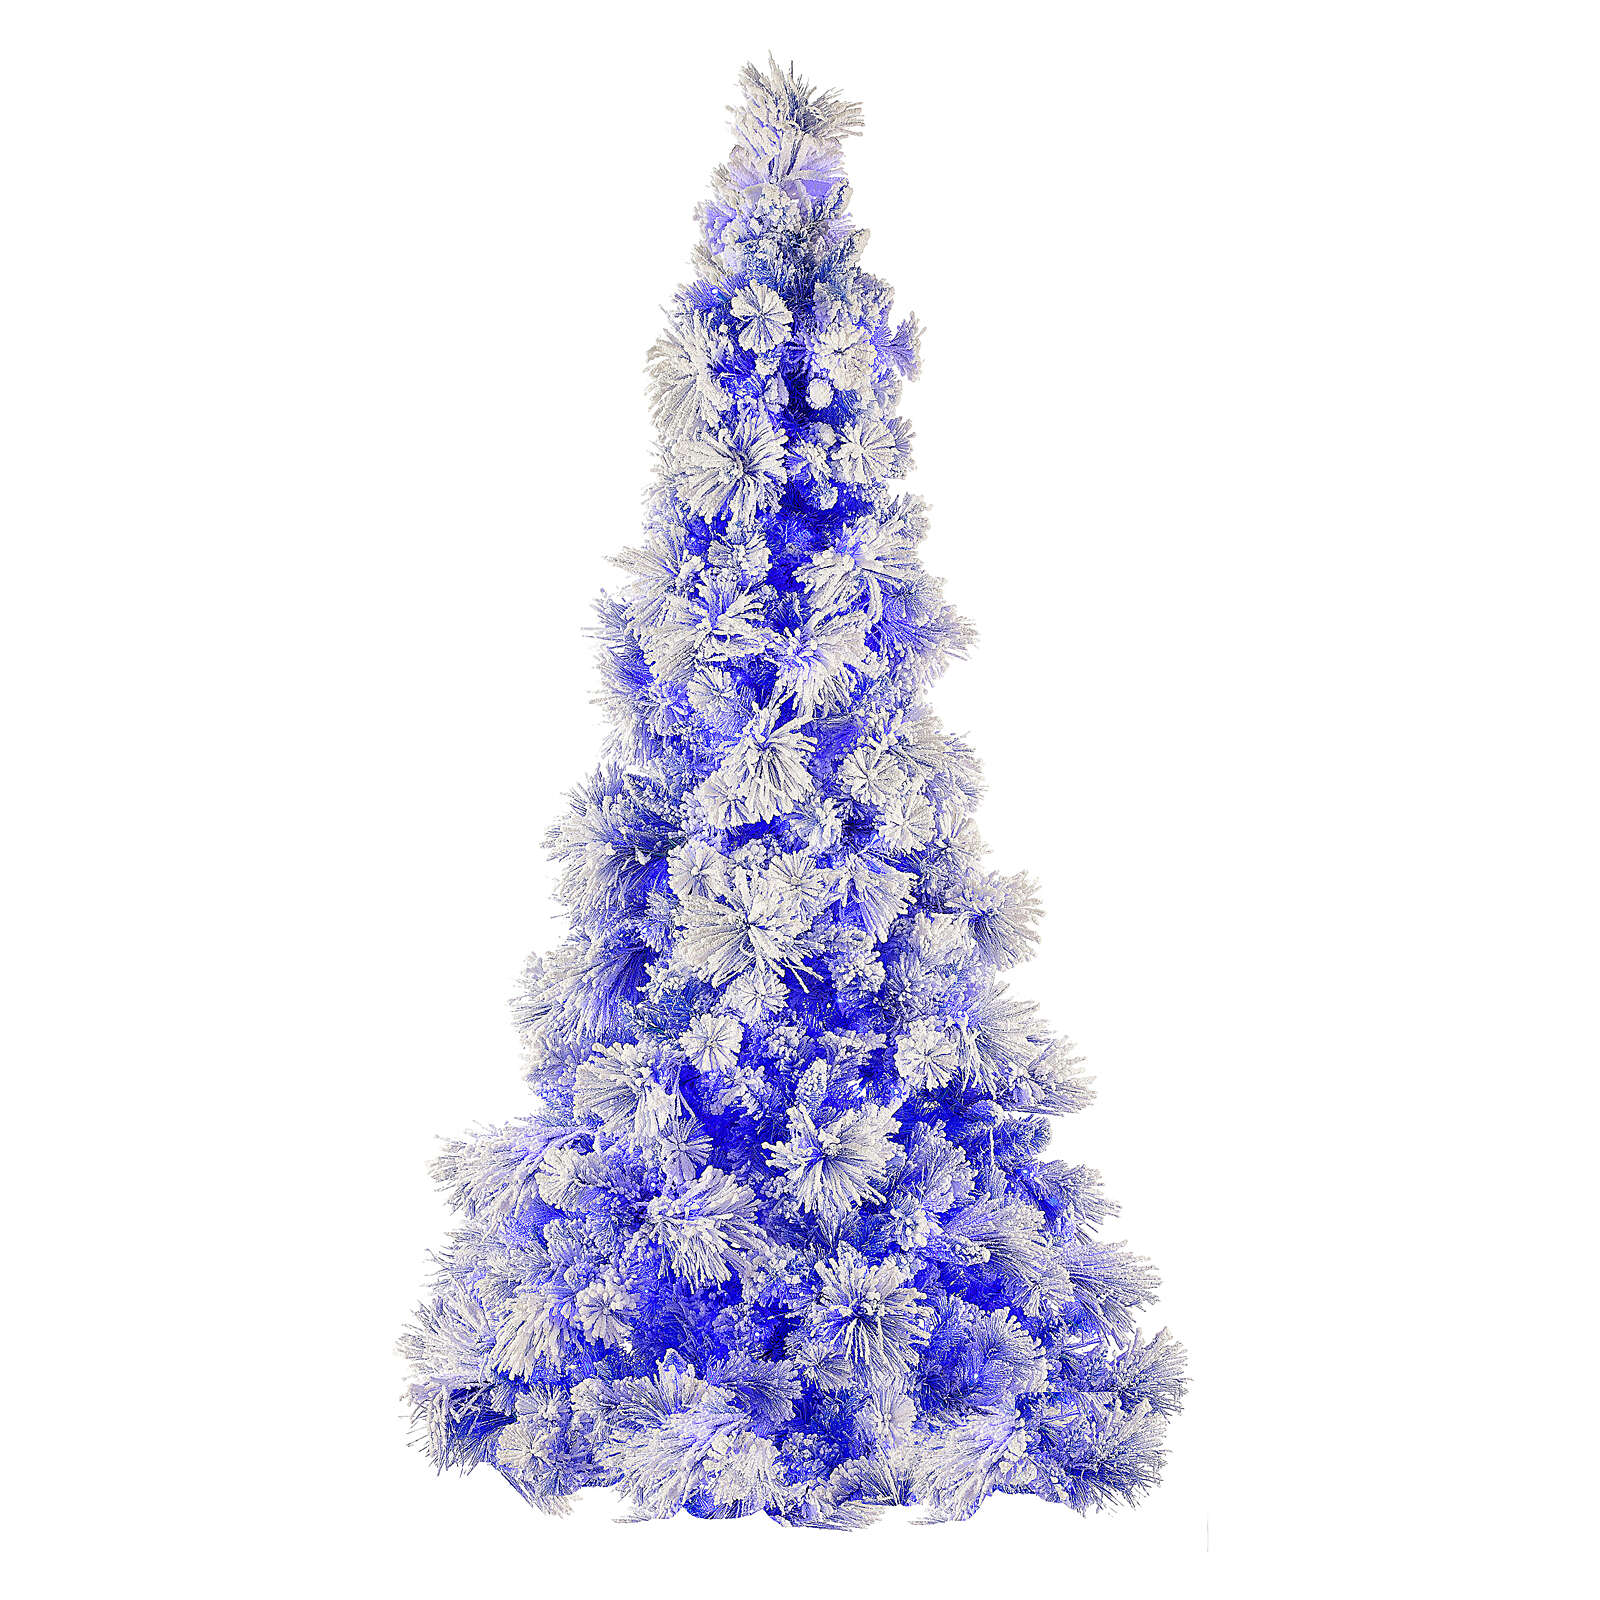 STOCK Snowy Virginia Blue Christmas tree 340 cm with 1100 LEDs 3